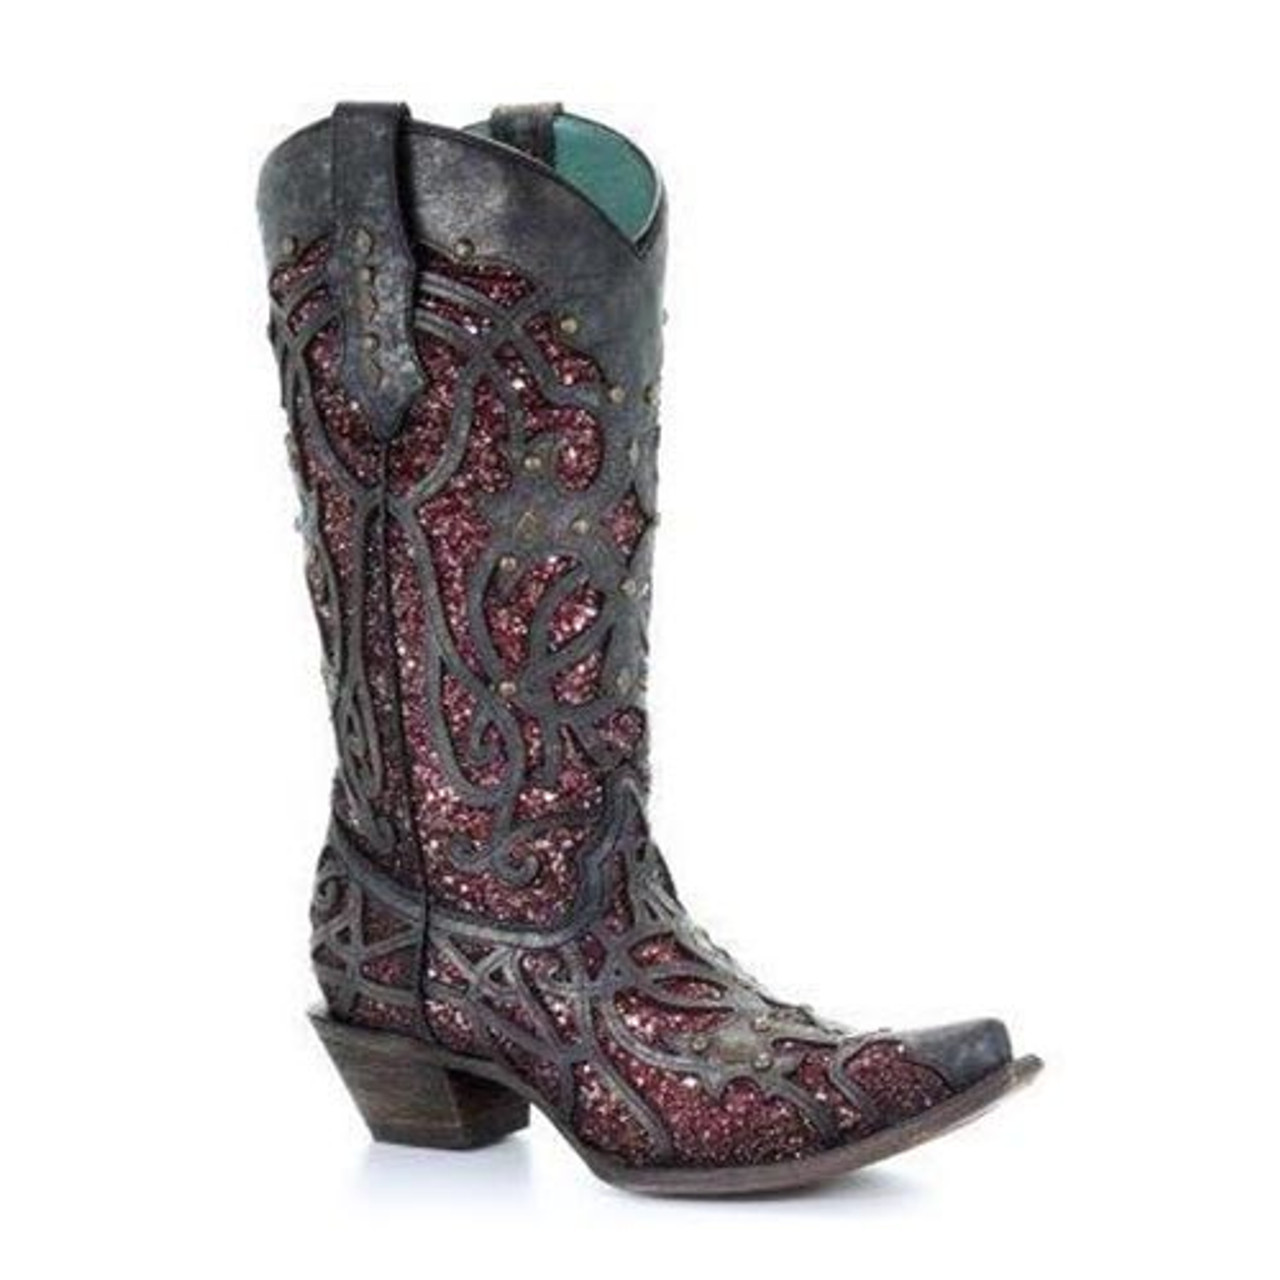 f39057c7742 Corral Women's Boots - Black / Plum Glitter Inlay & Studs - Snip Toe